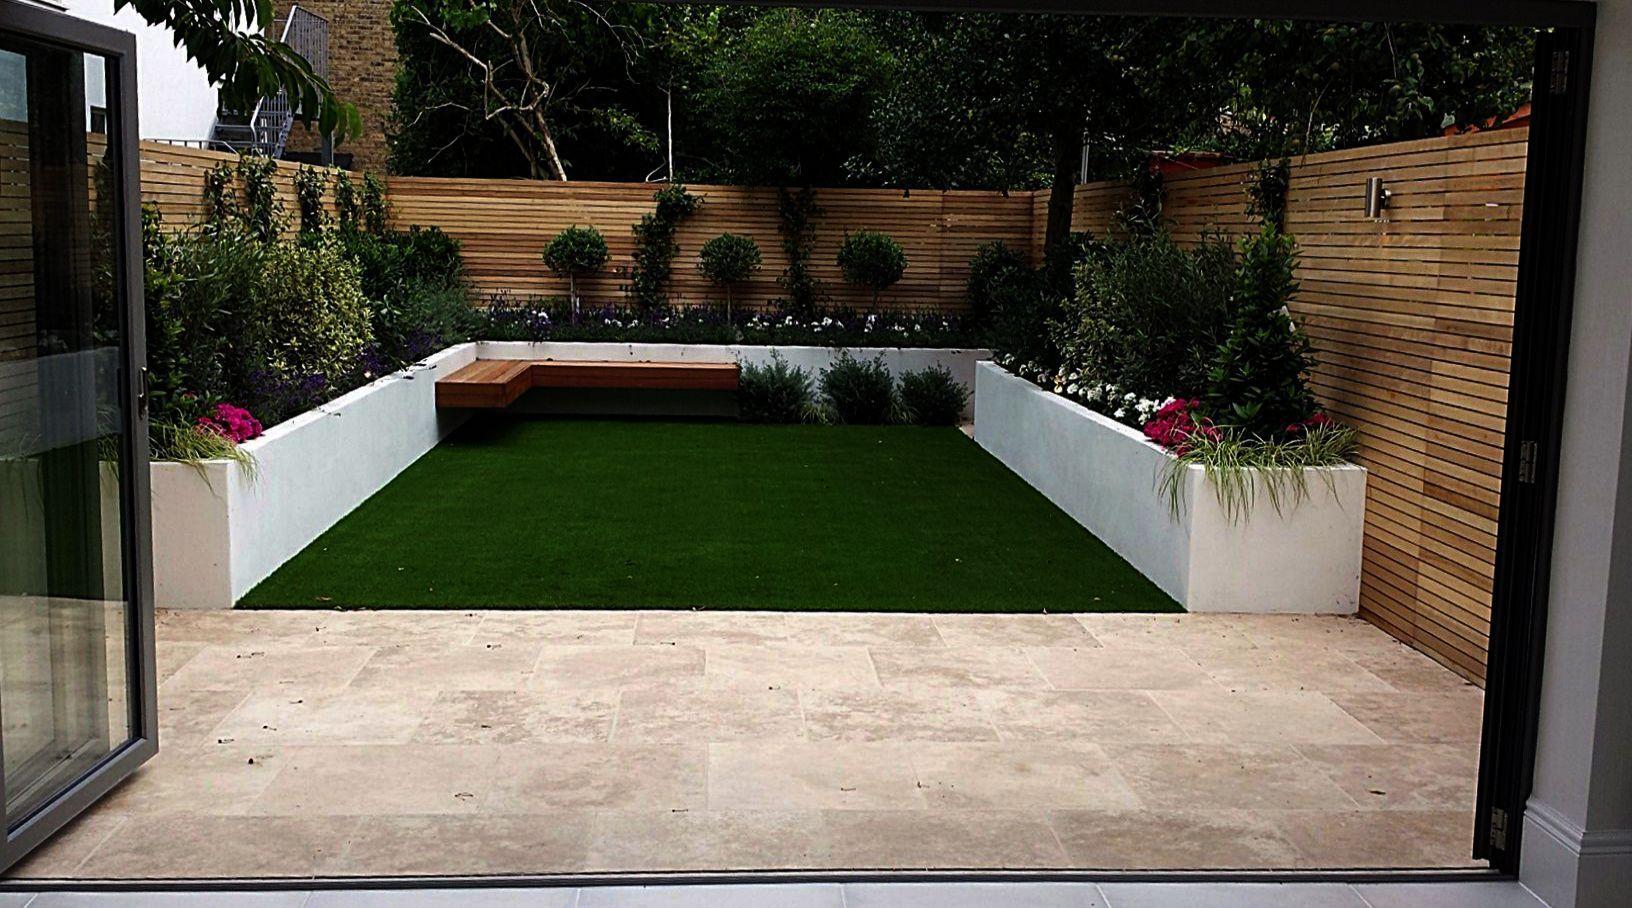 Landscape Gardening Ideas For Slopes Many Landscape Gardening Jobs